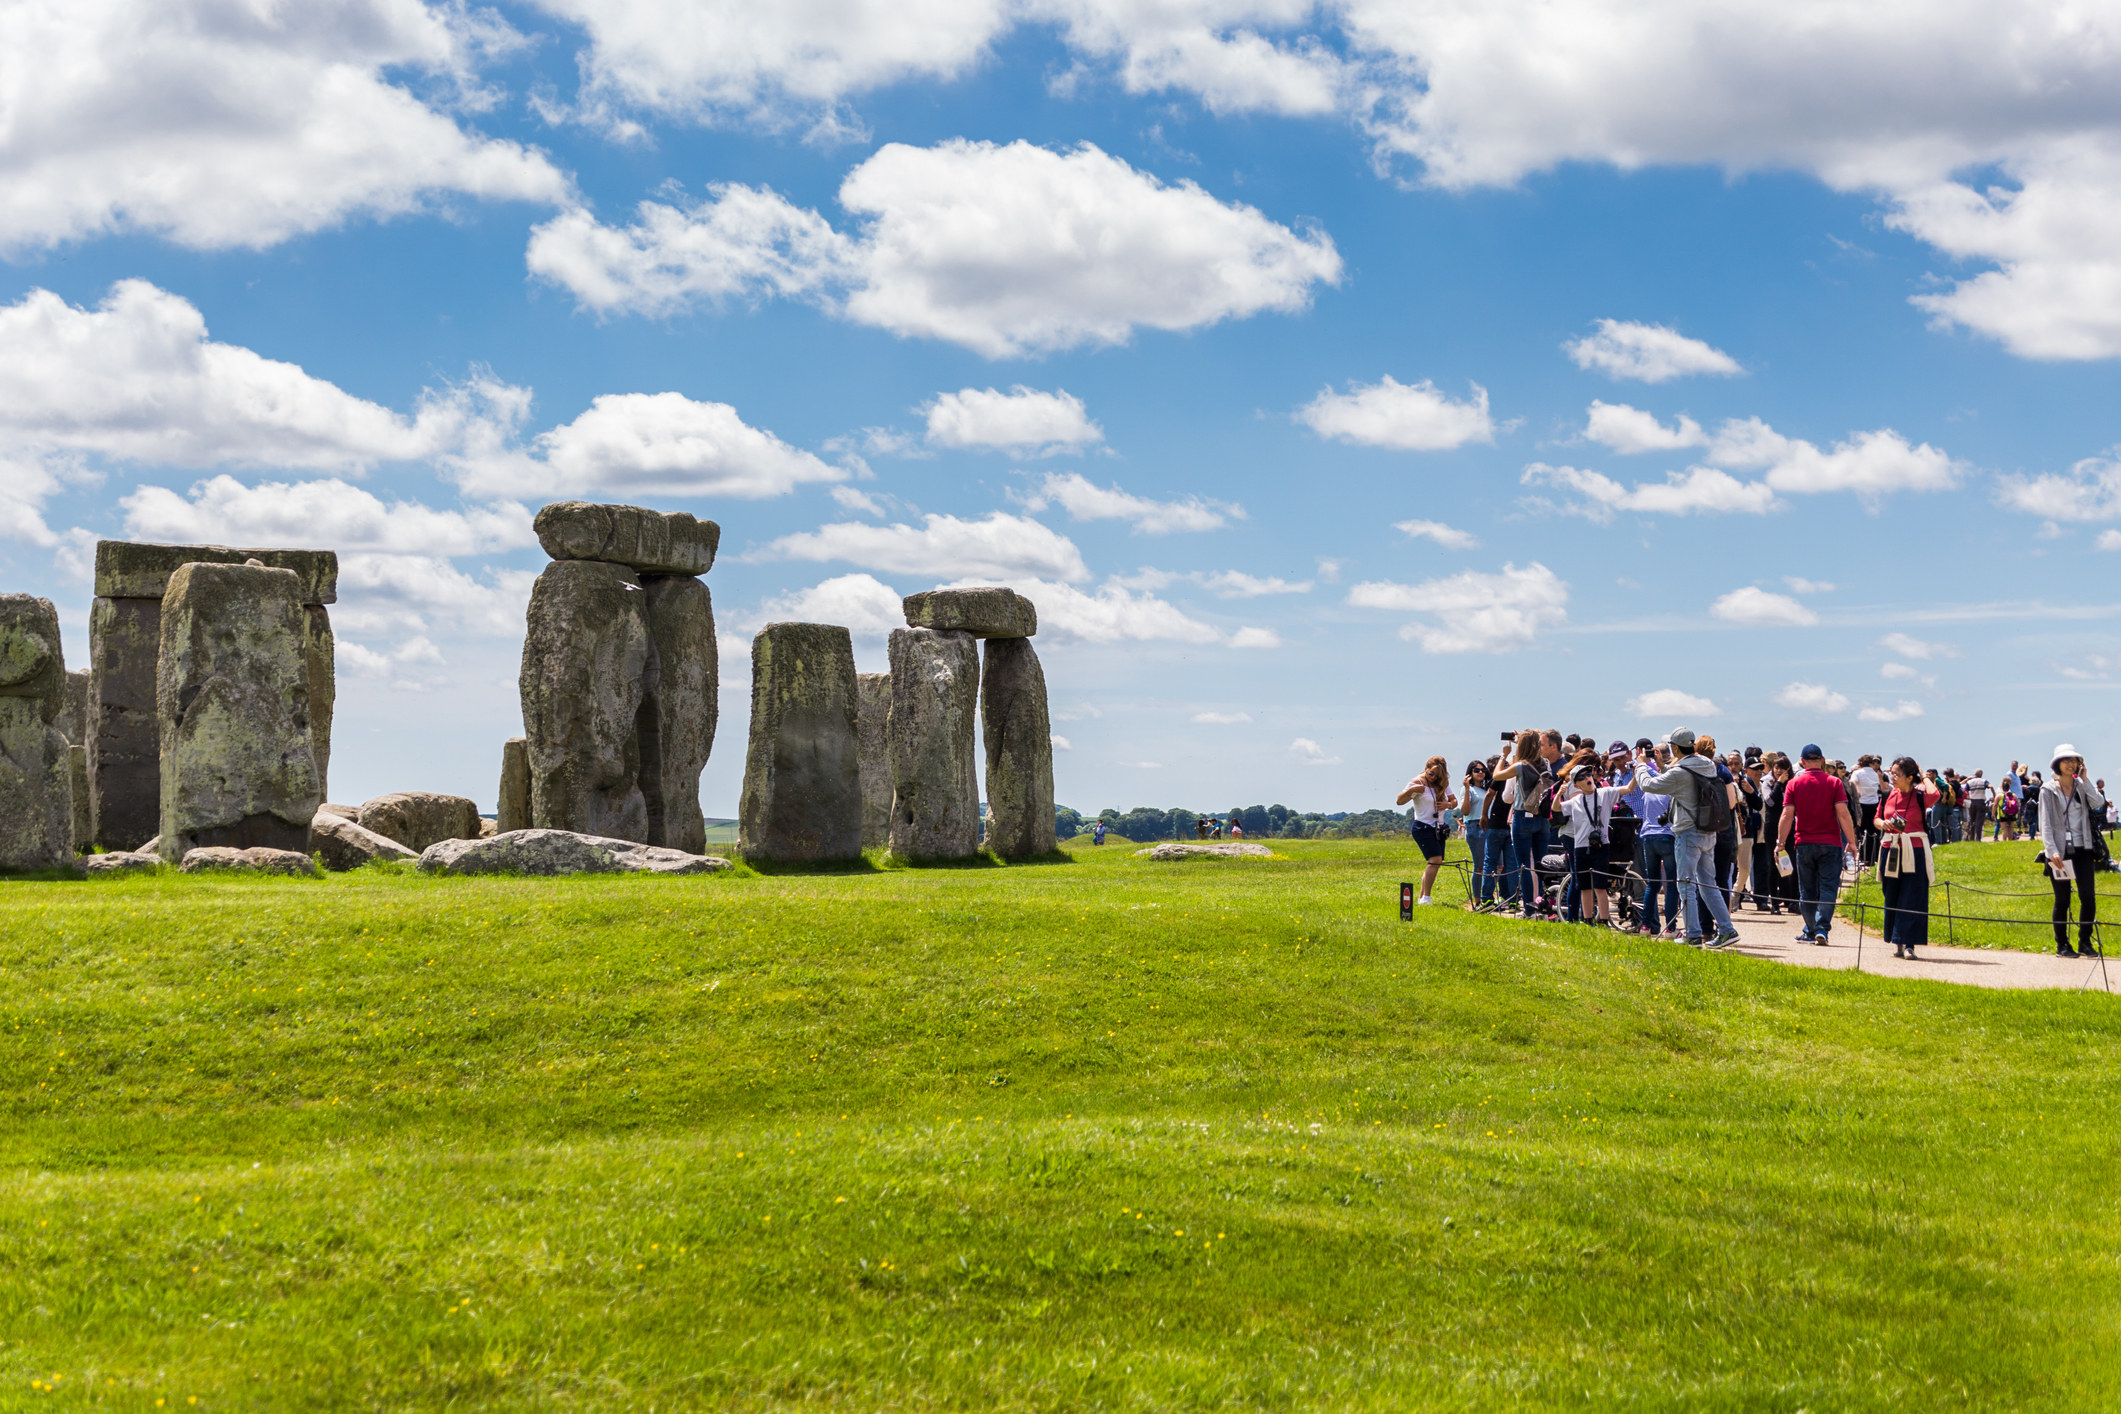 Crowds arriving to visit Stonehenge